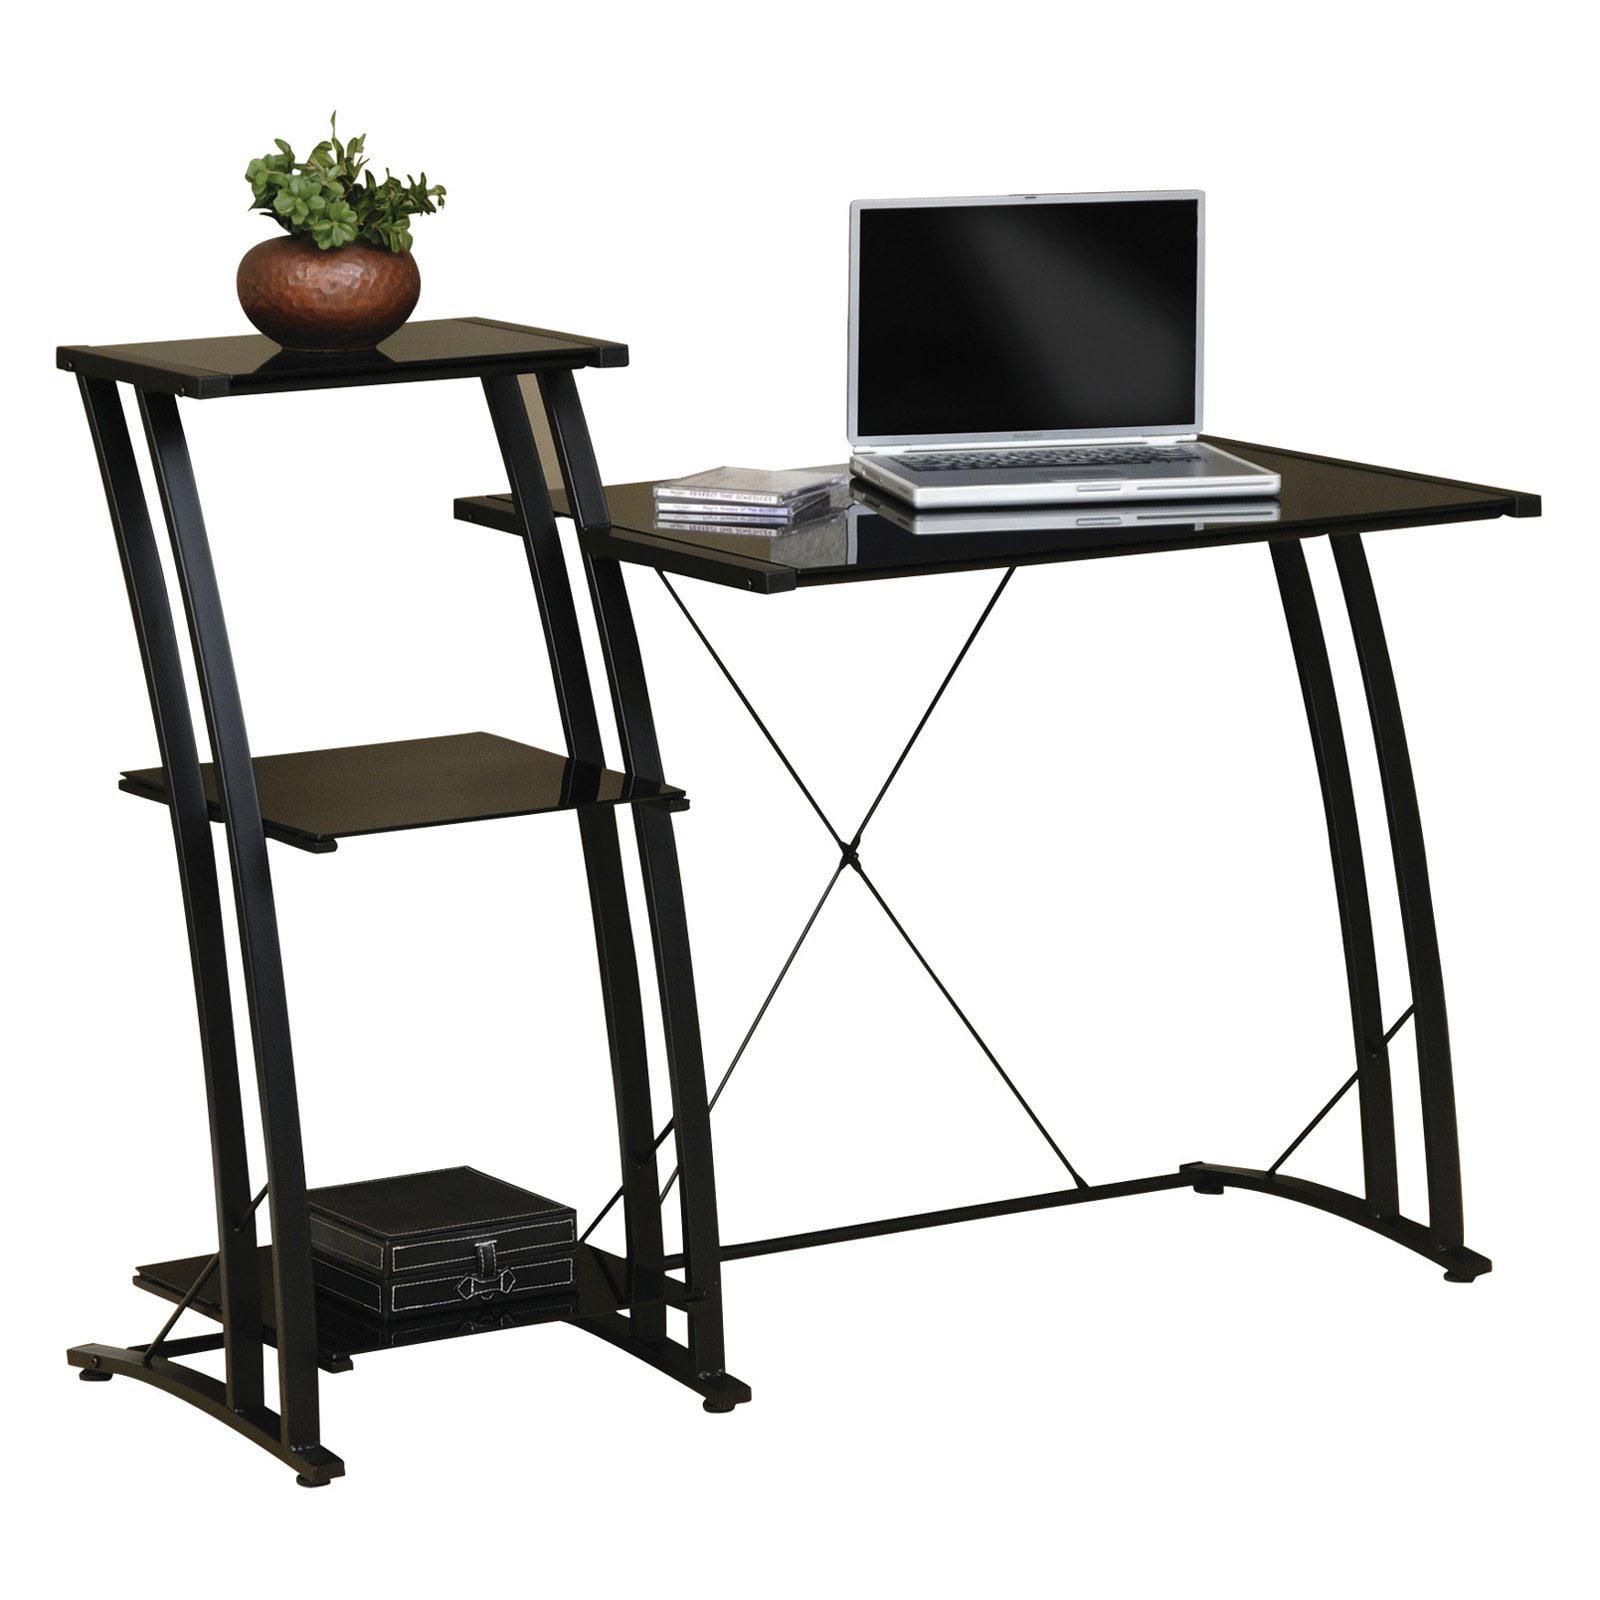 Sauder Deco Tiered Desk Black Finish Walmart Com